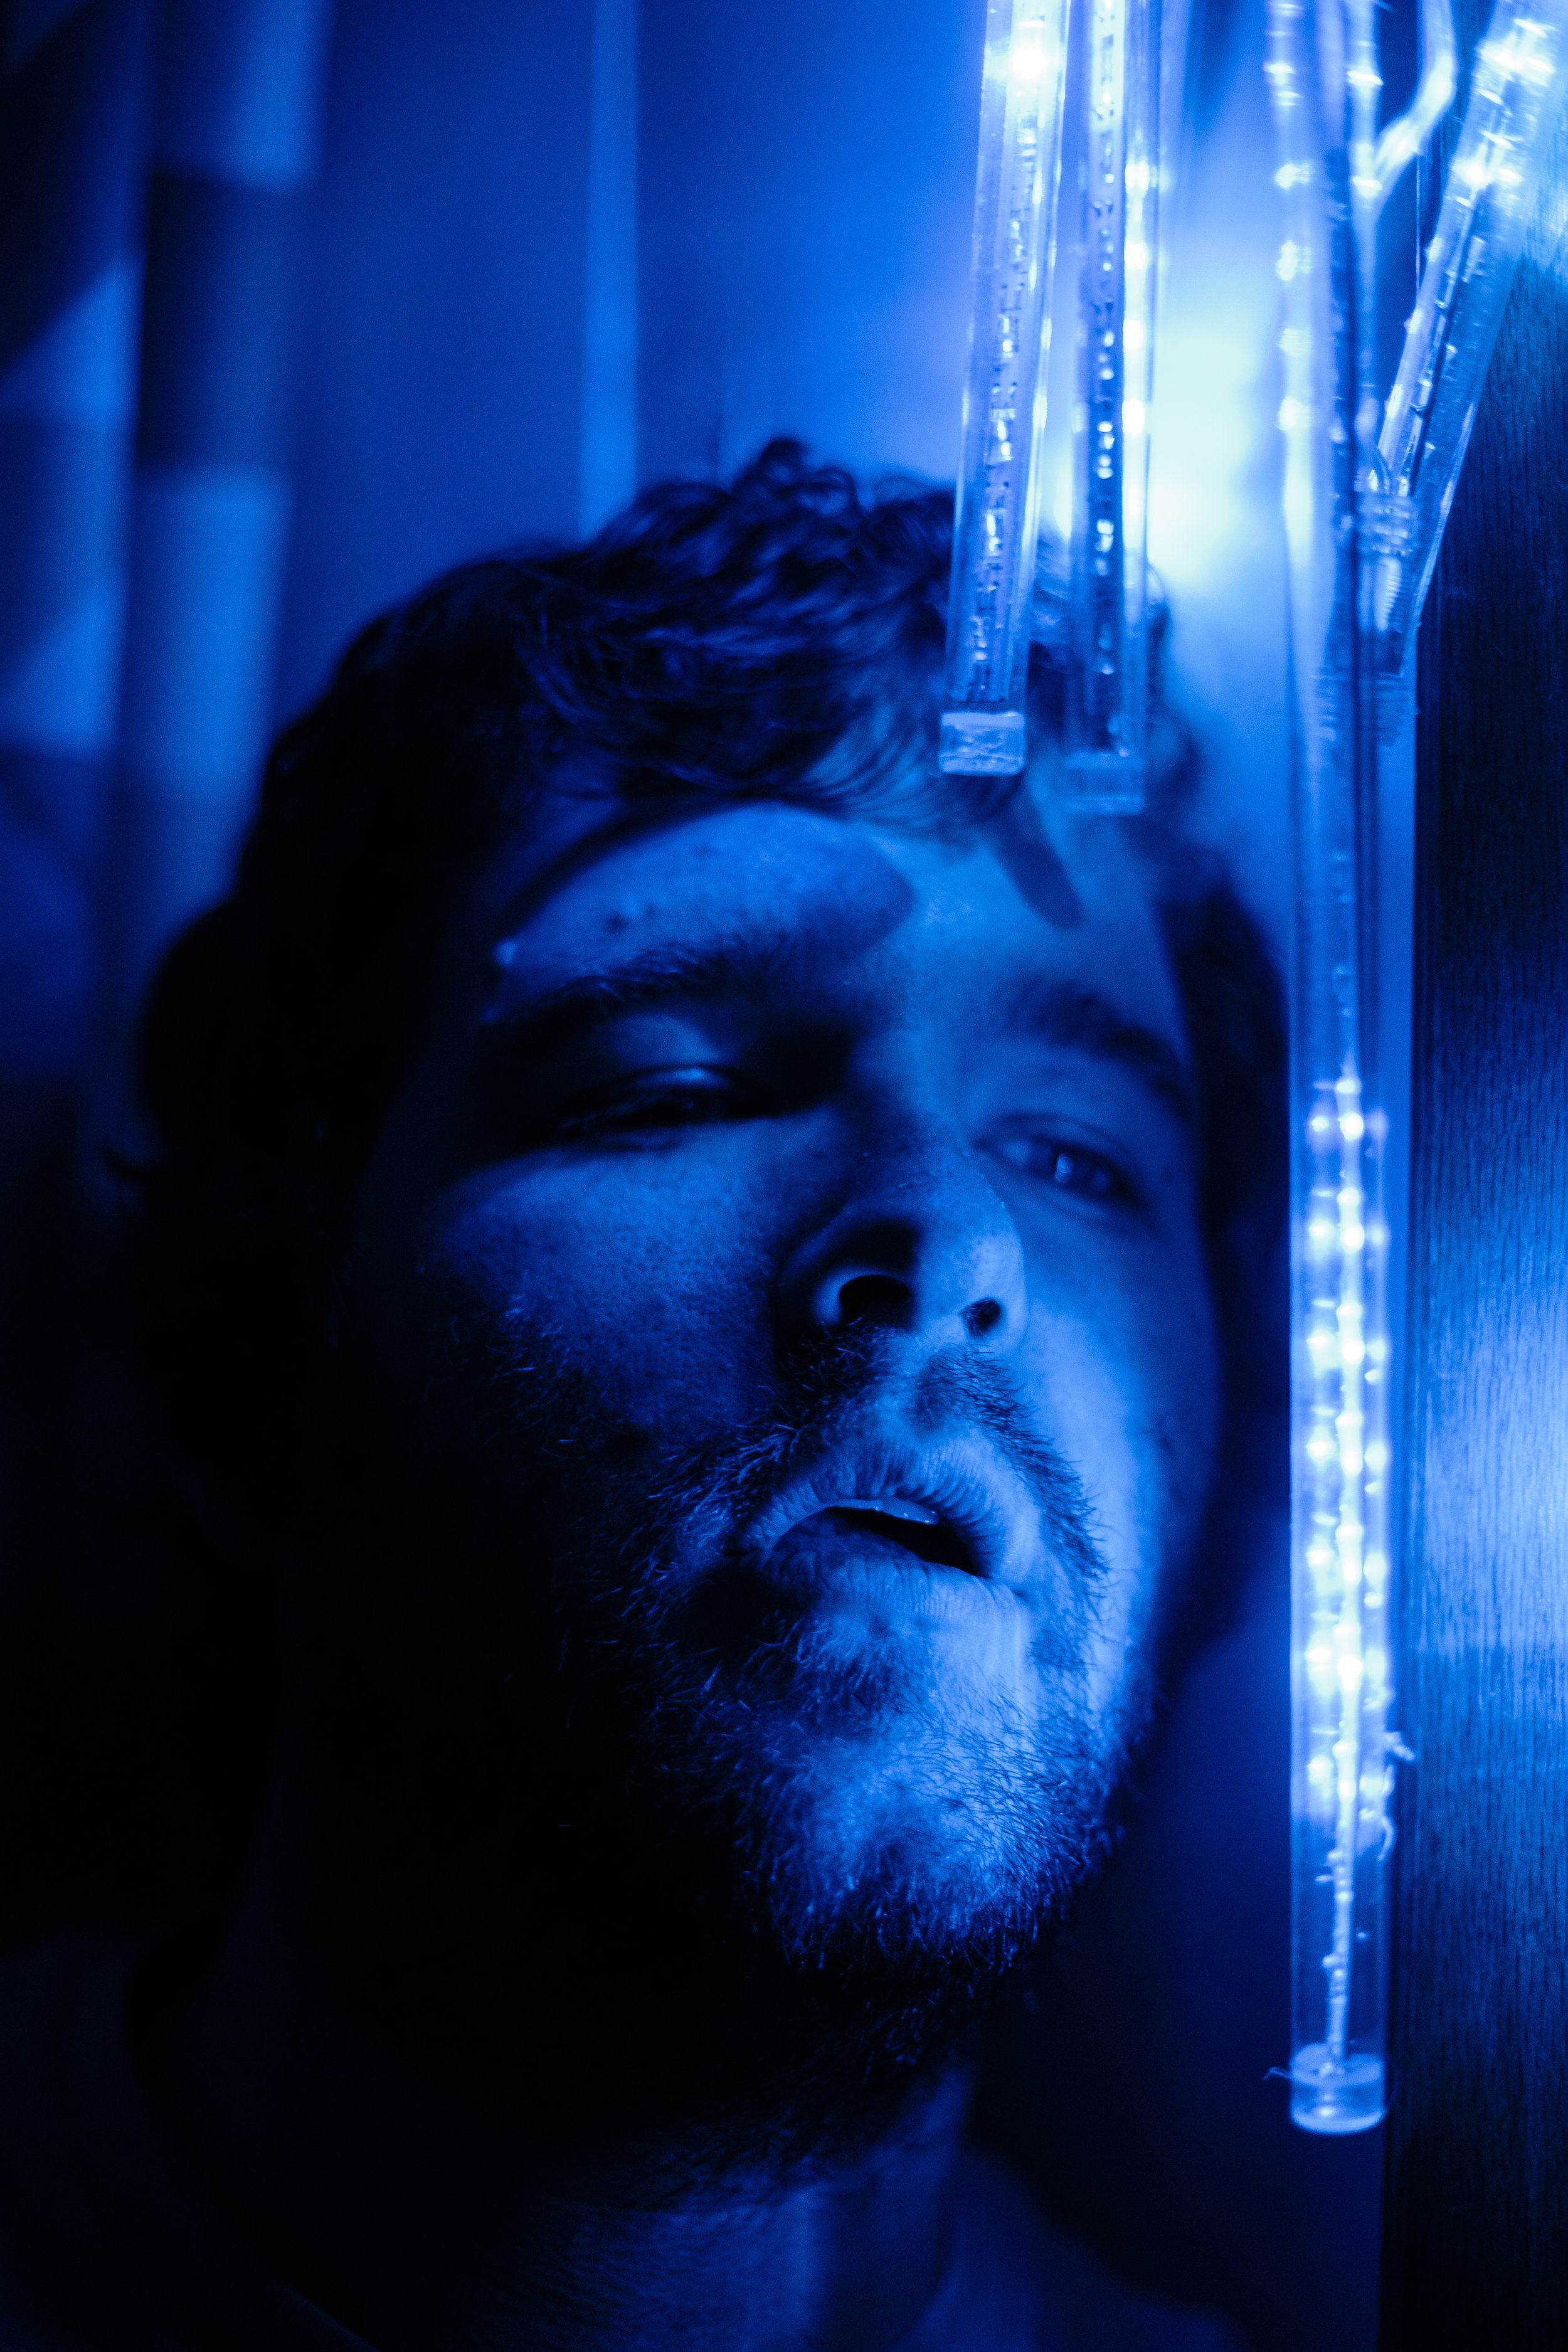 Blue Bathroom Light 4.jpg